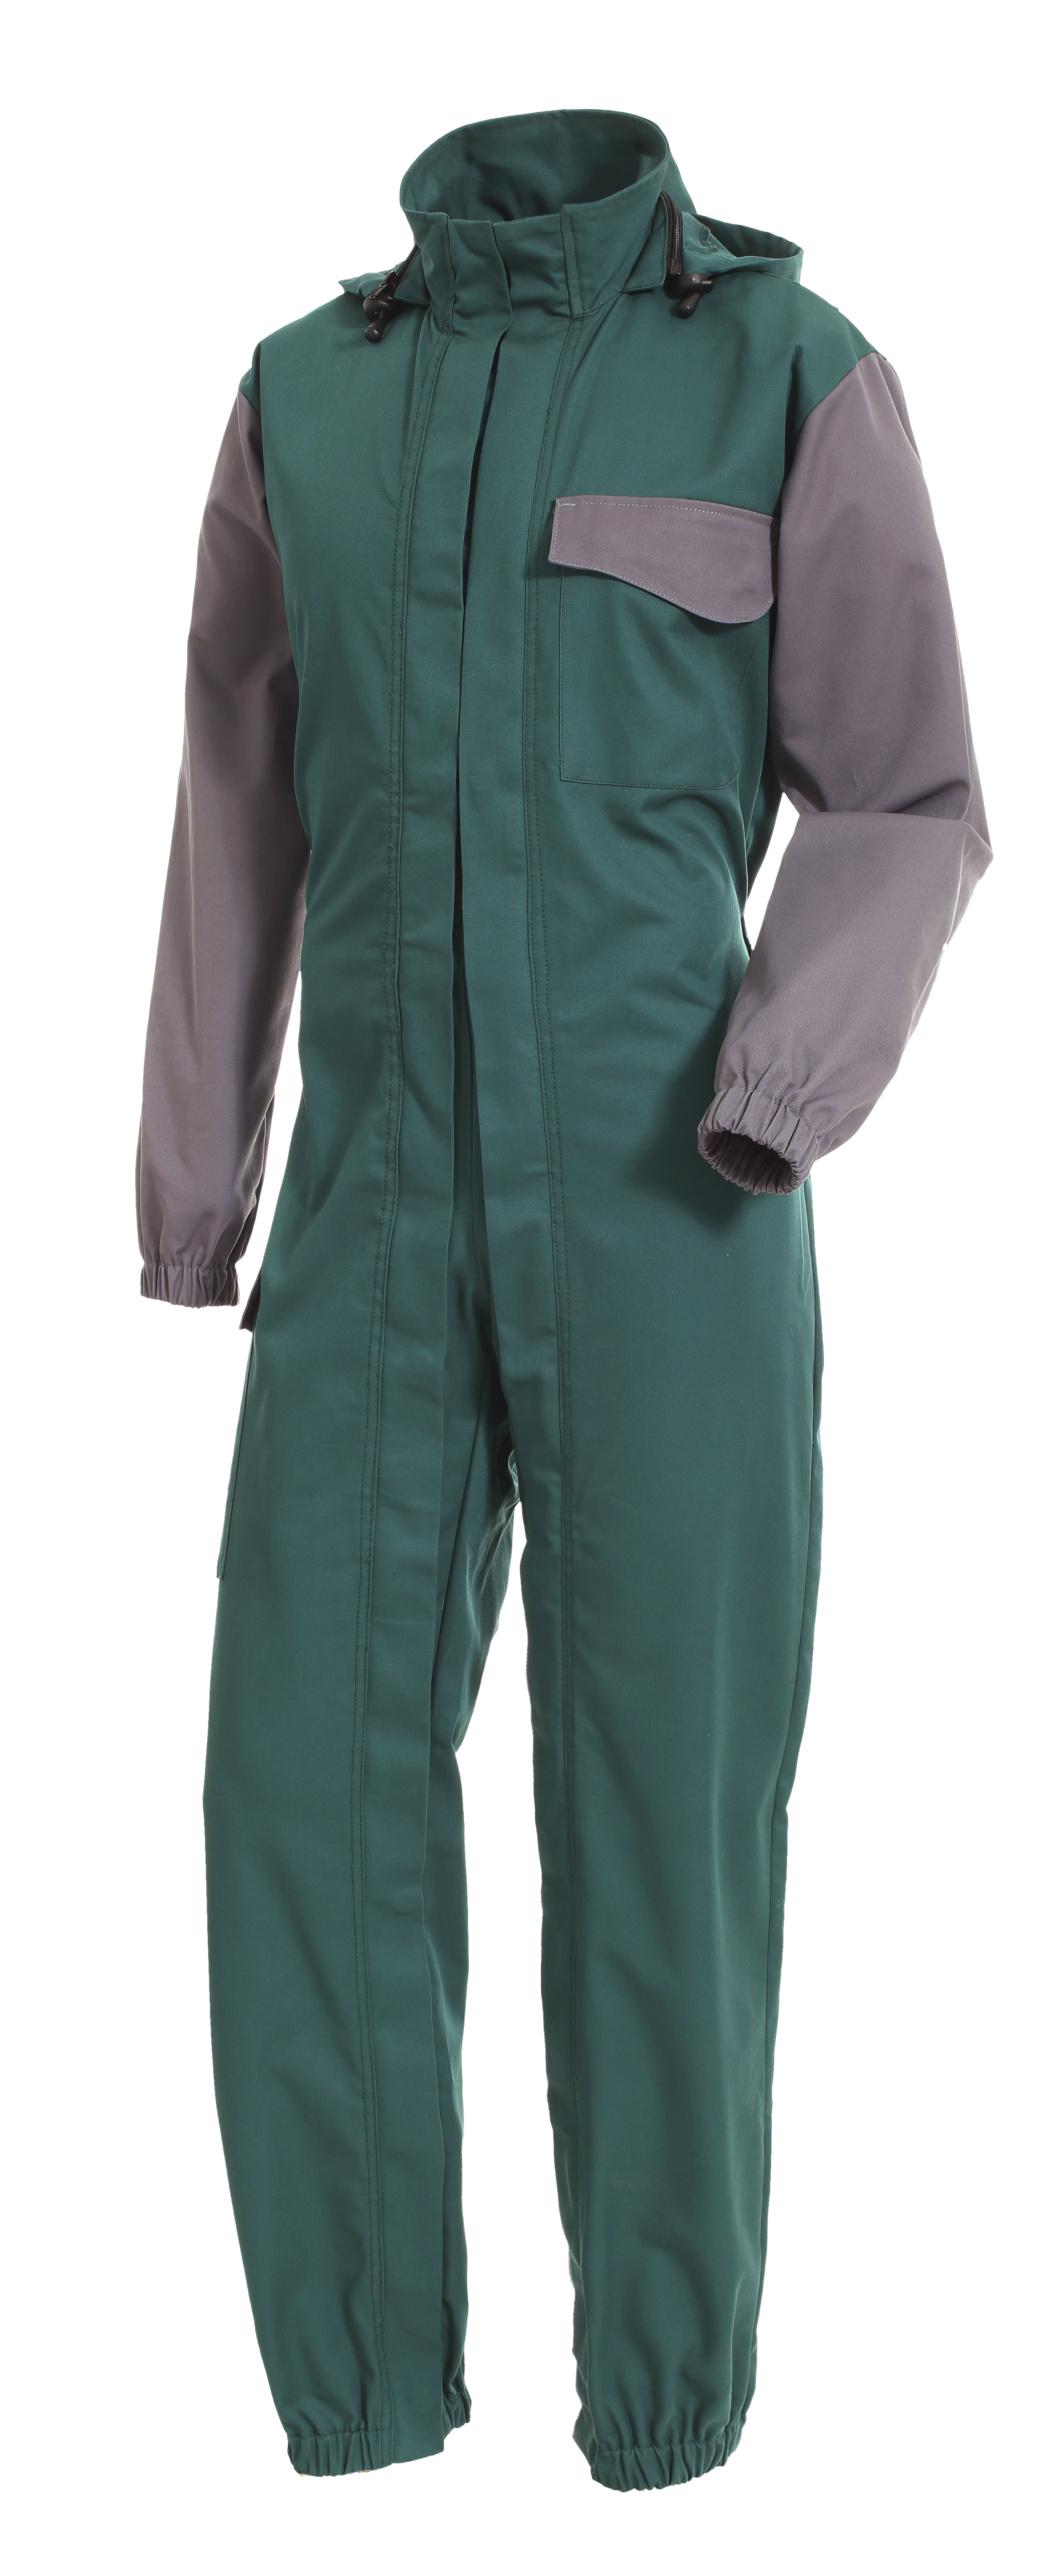 Pflanzenschutz-Overall Aegis ISO27065 C2, Gr. L (48/50)